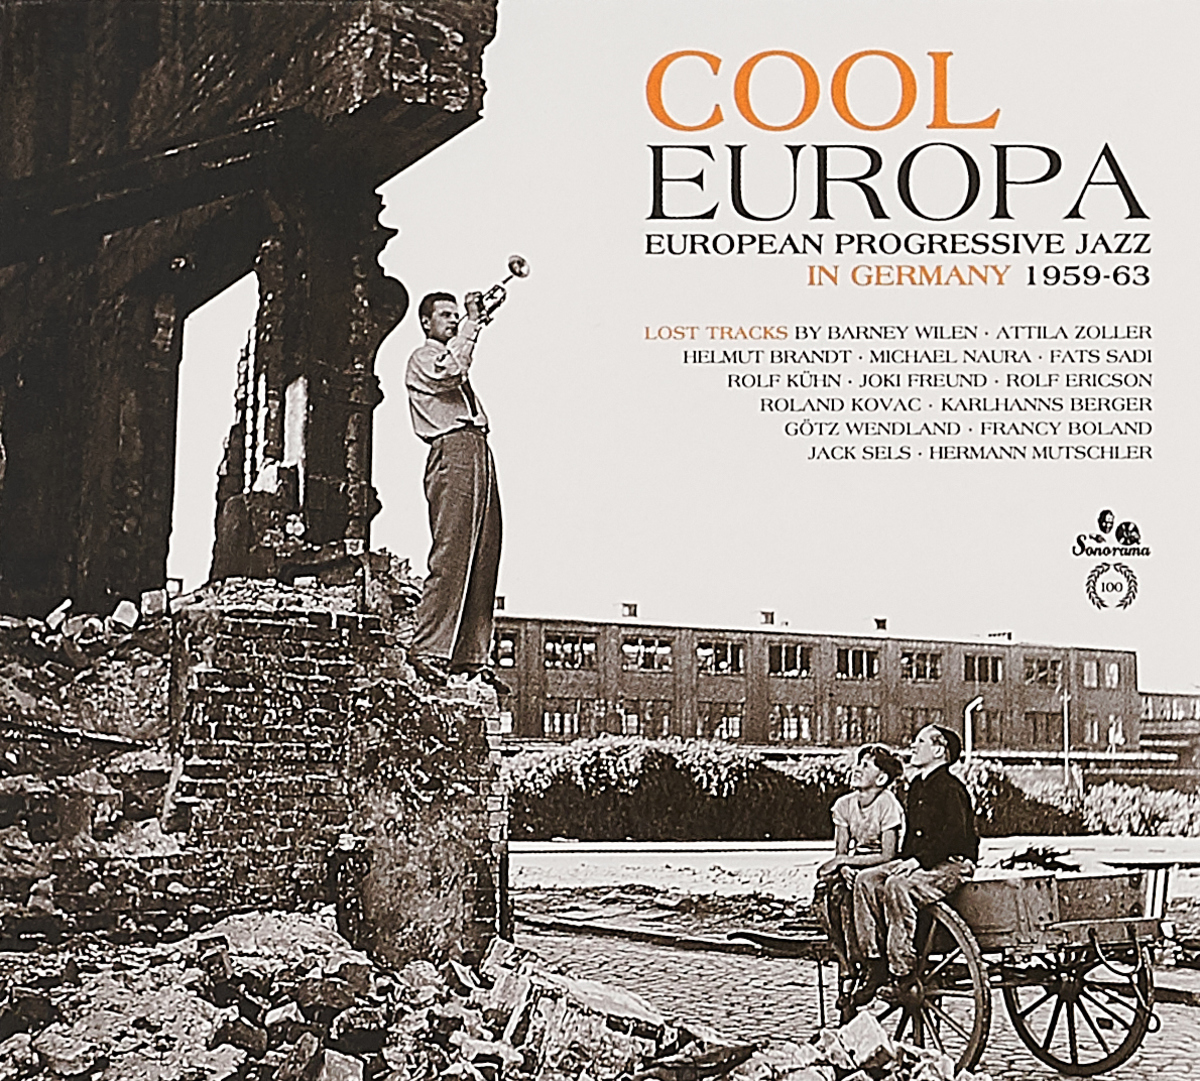 Fats Sadi Quintet,Rolf Ericson Quintet Cool Europa. European Progressive Jazz eilenkrig crew quintet